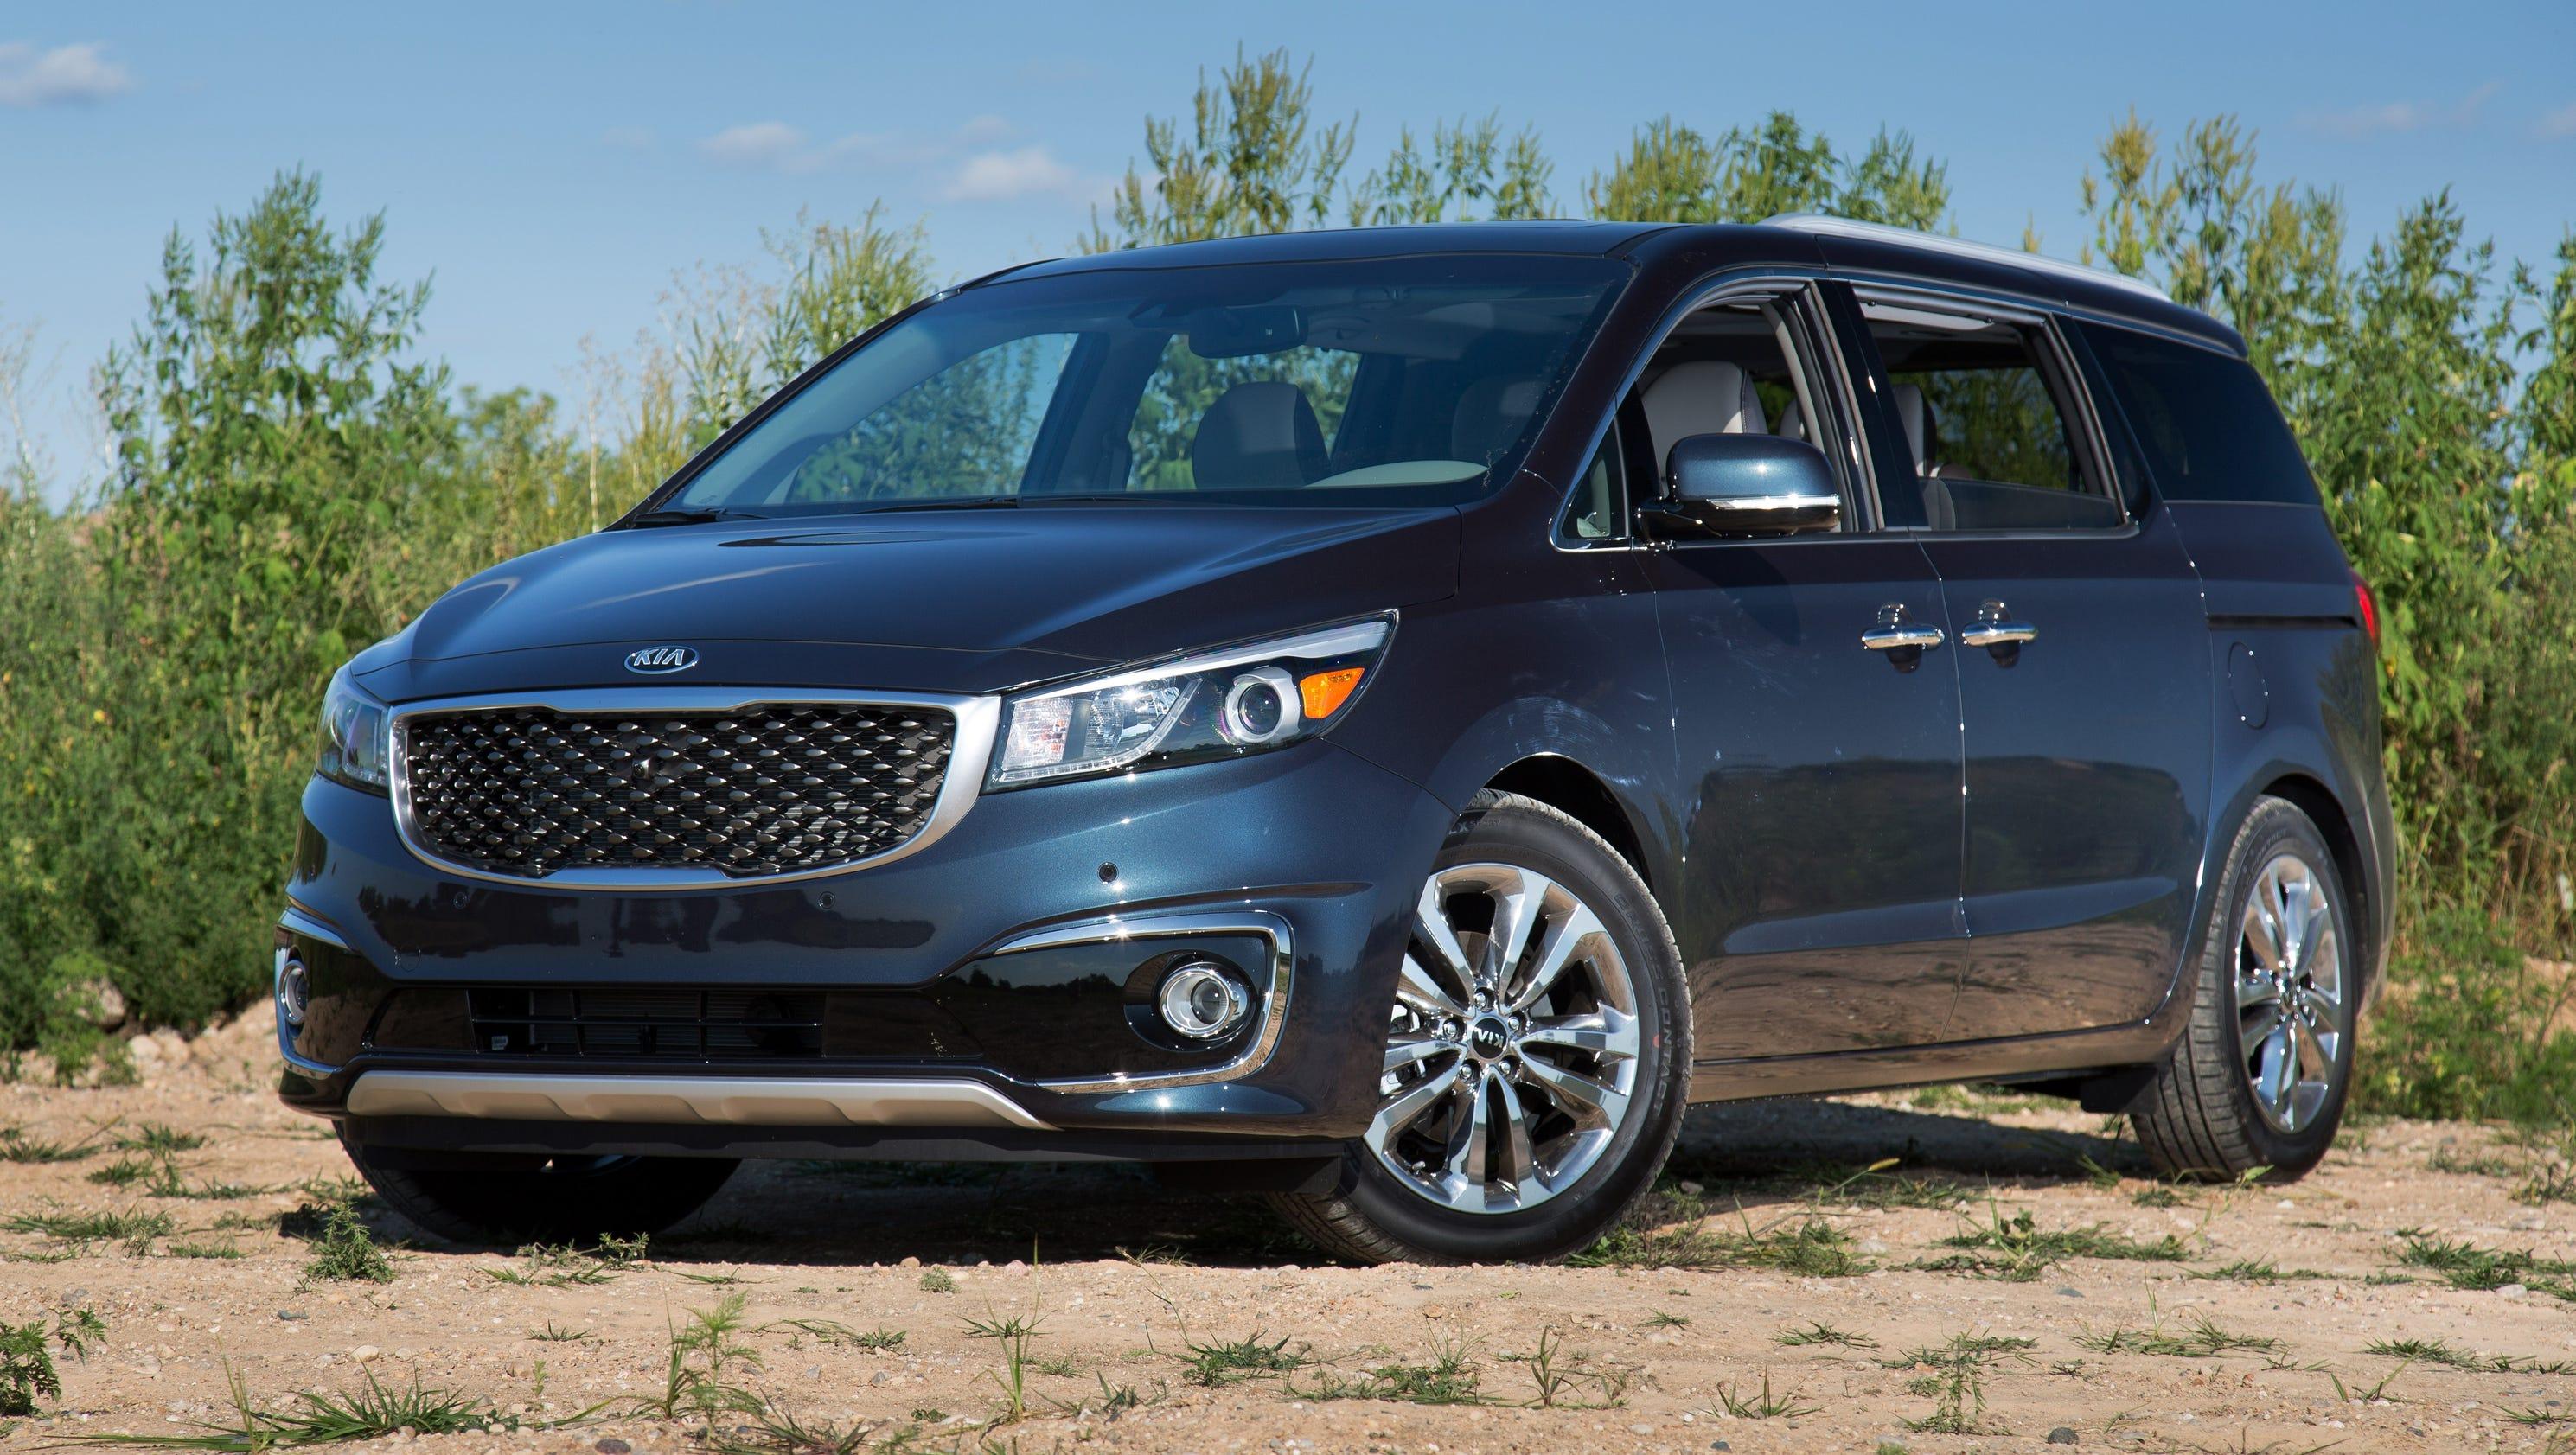 kia rises to top of minivan competition. Black Bedroom Furniture Sets. Home Design Ideas